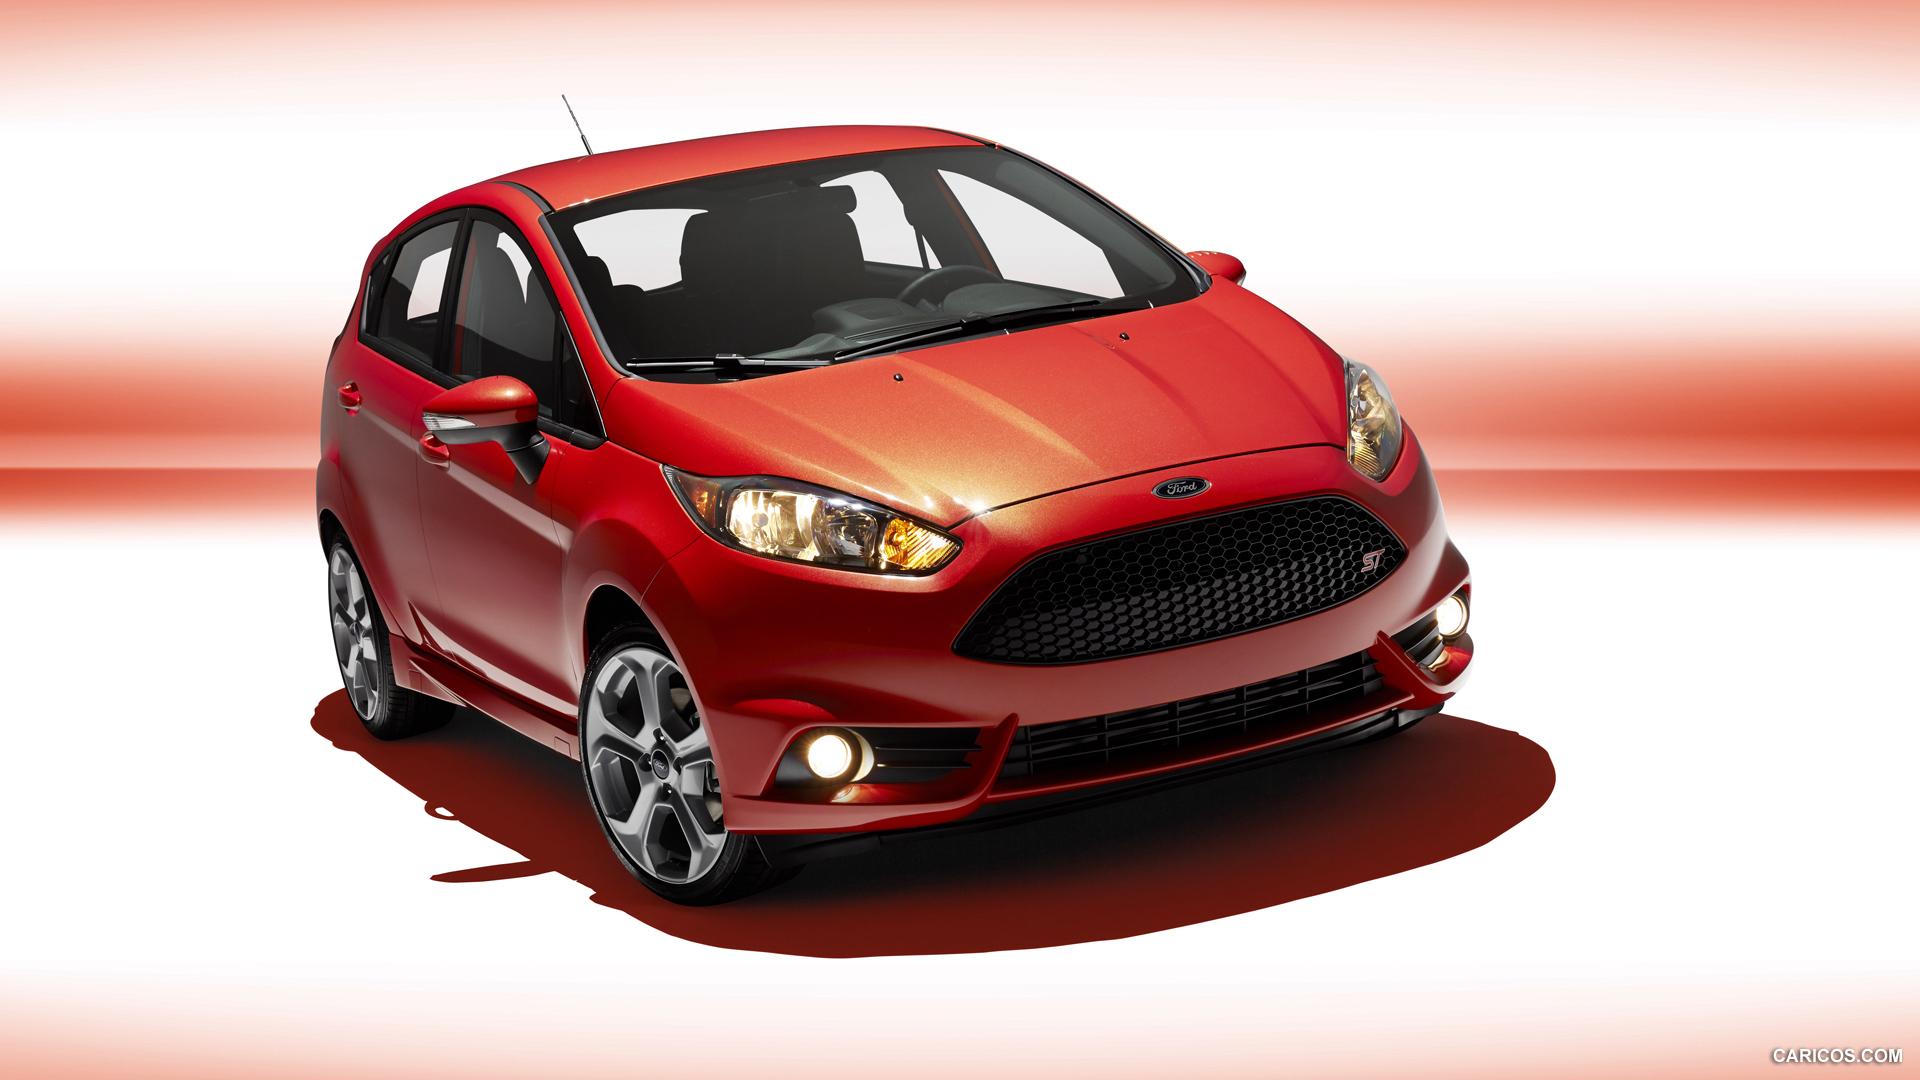 Форд Фиеста 2014 фото, цена, видео, отзывы, характеристики ...